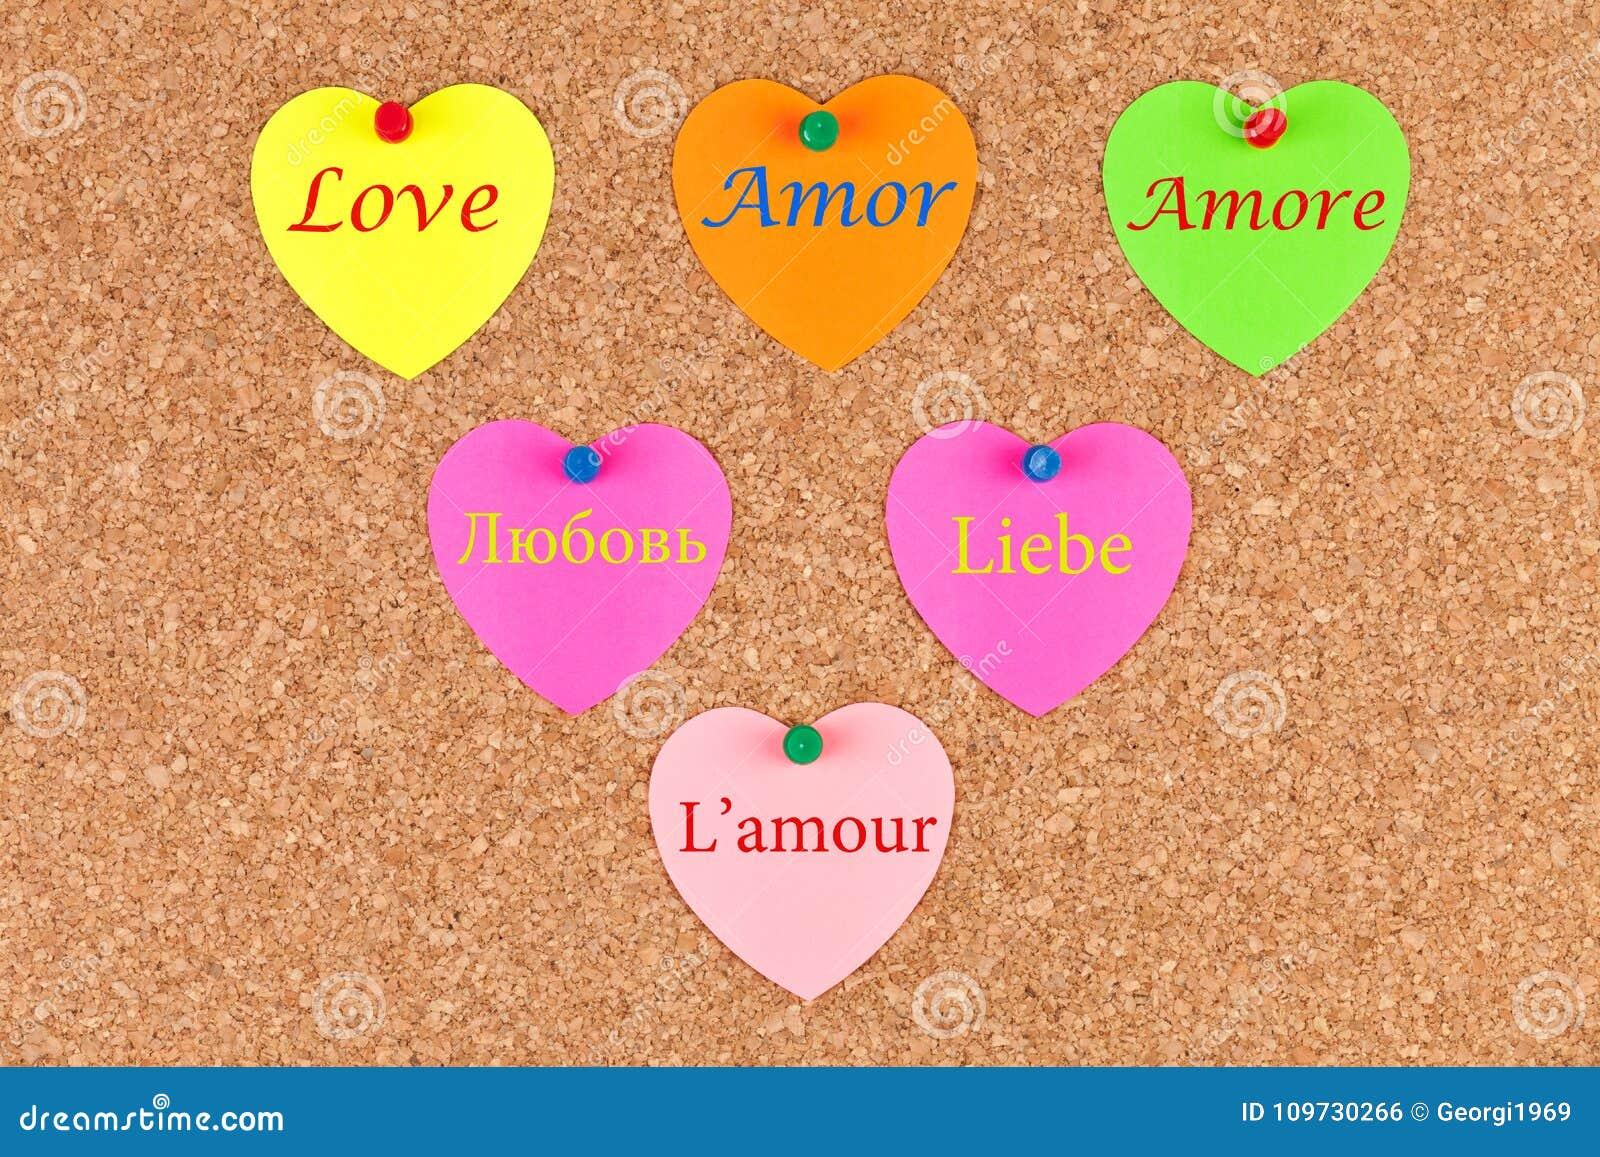 liefde in verschillende talen